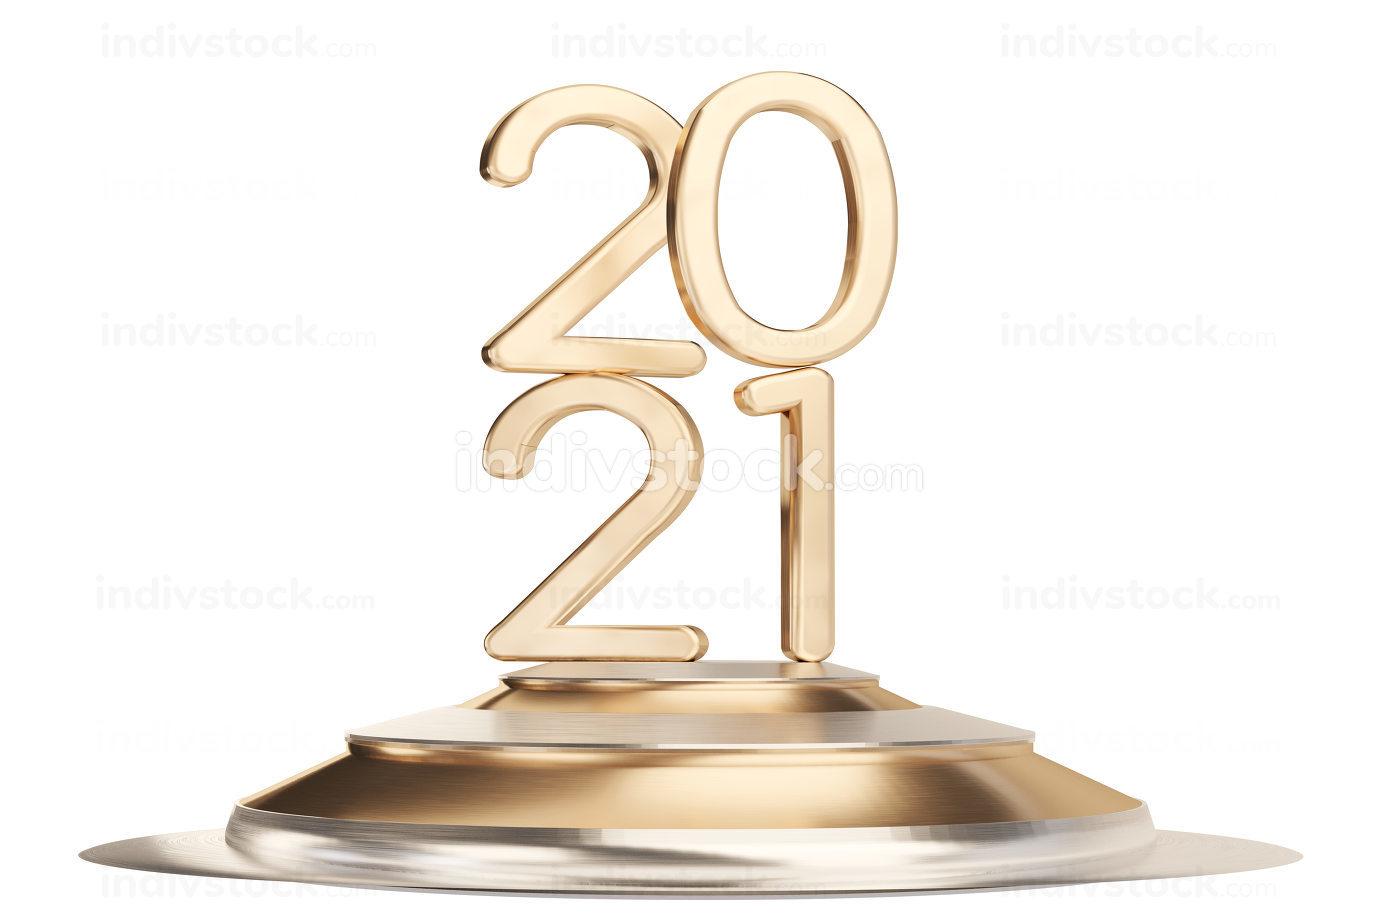 2021 golden symbol thin letters 3d-illustration